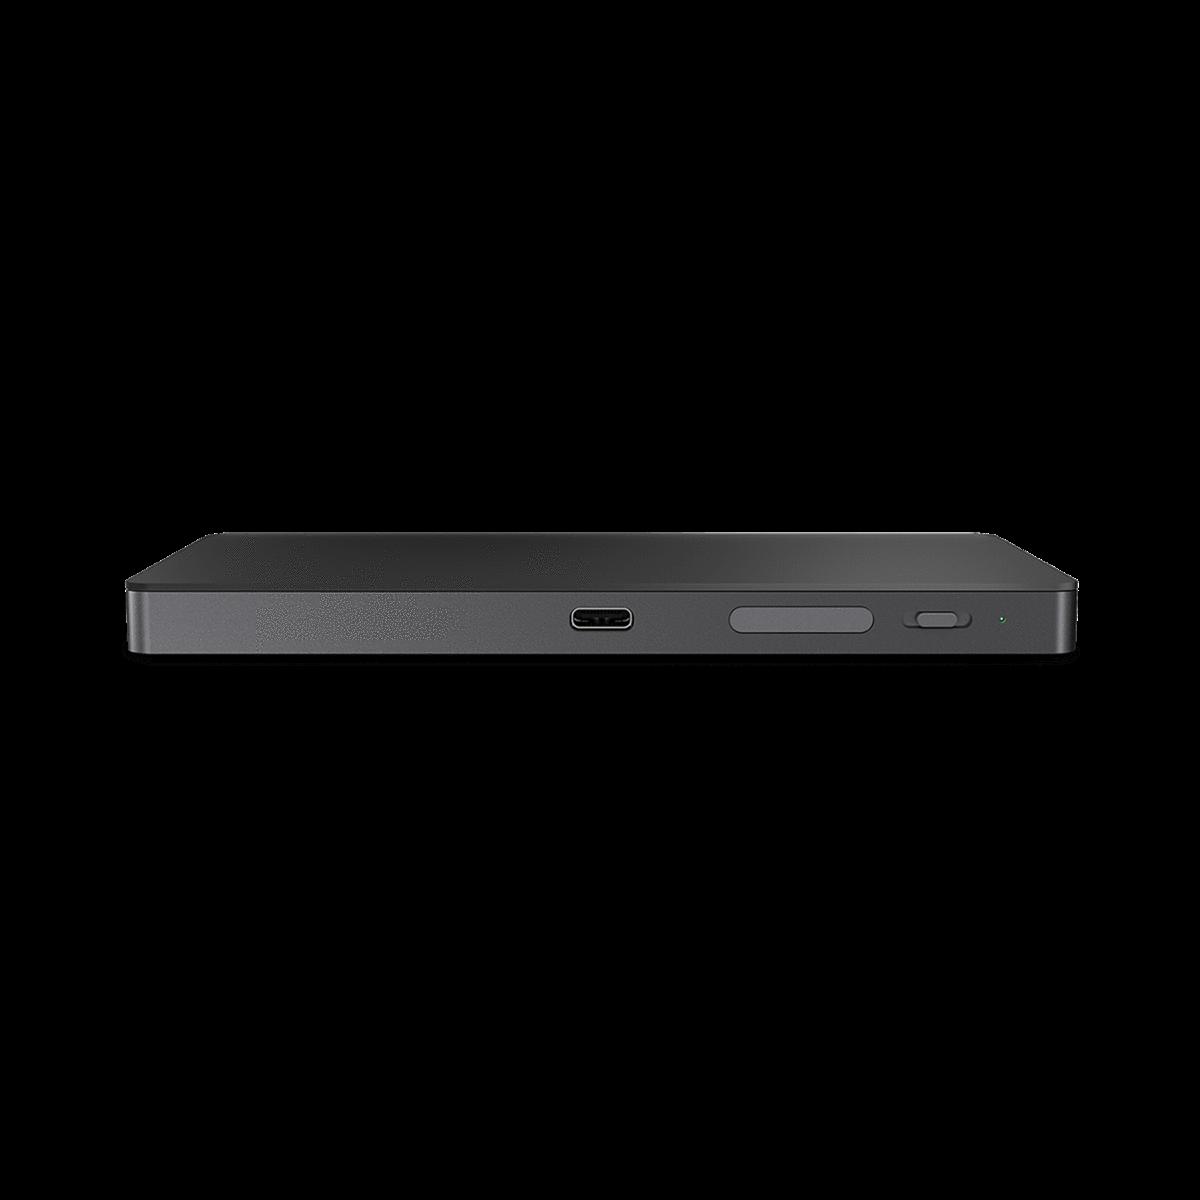 Порт USB-C для зарядки и порт антенны на трекпаде iTrack